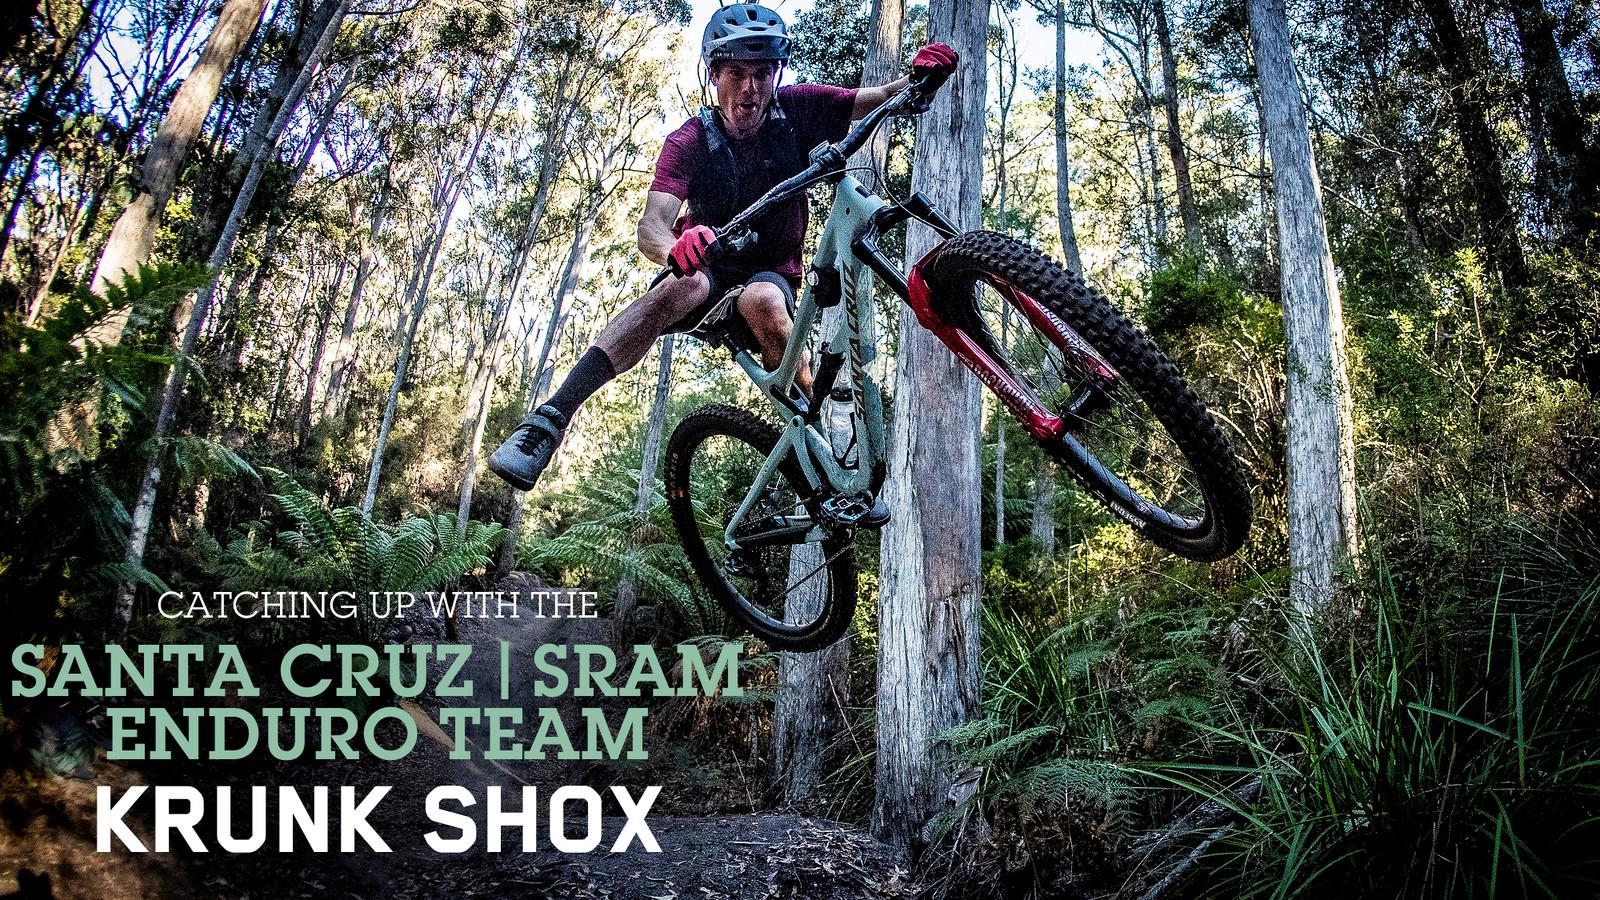 Catching up with the Santa Cruz | SRAM Enduro Team - Part 3: Alex 'Krunk Shox' McGuinnis